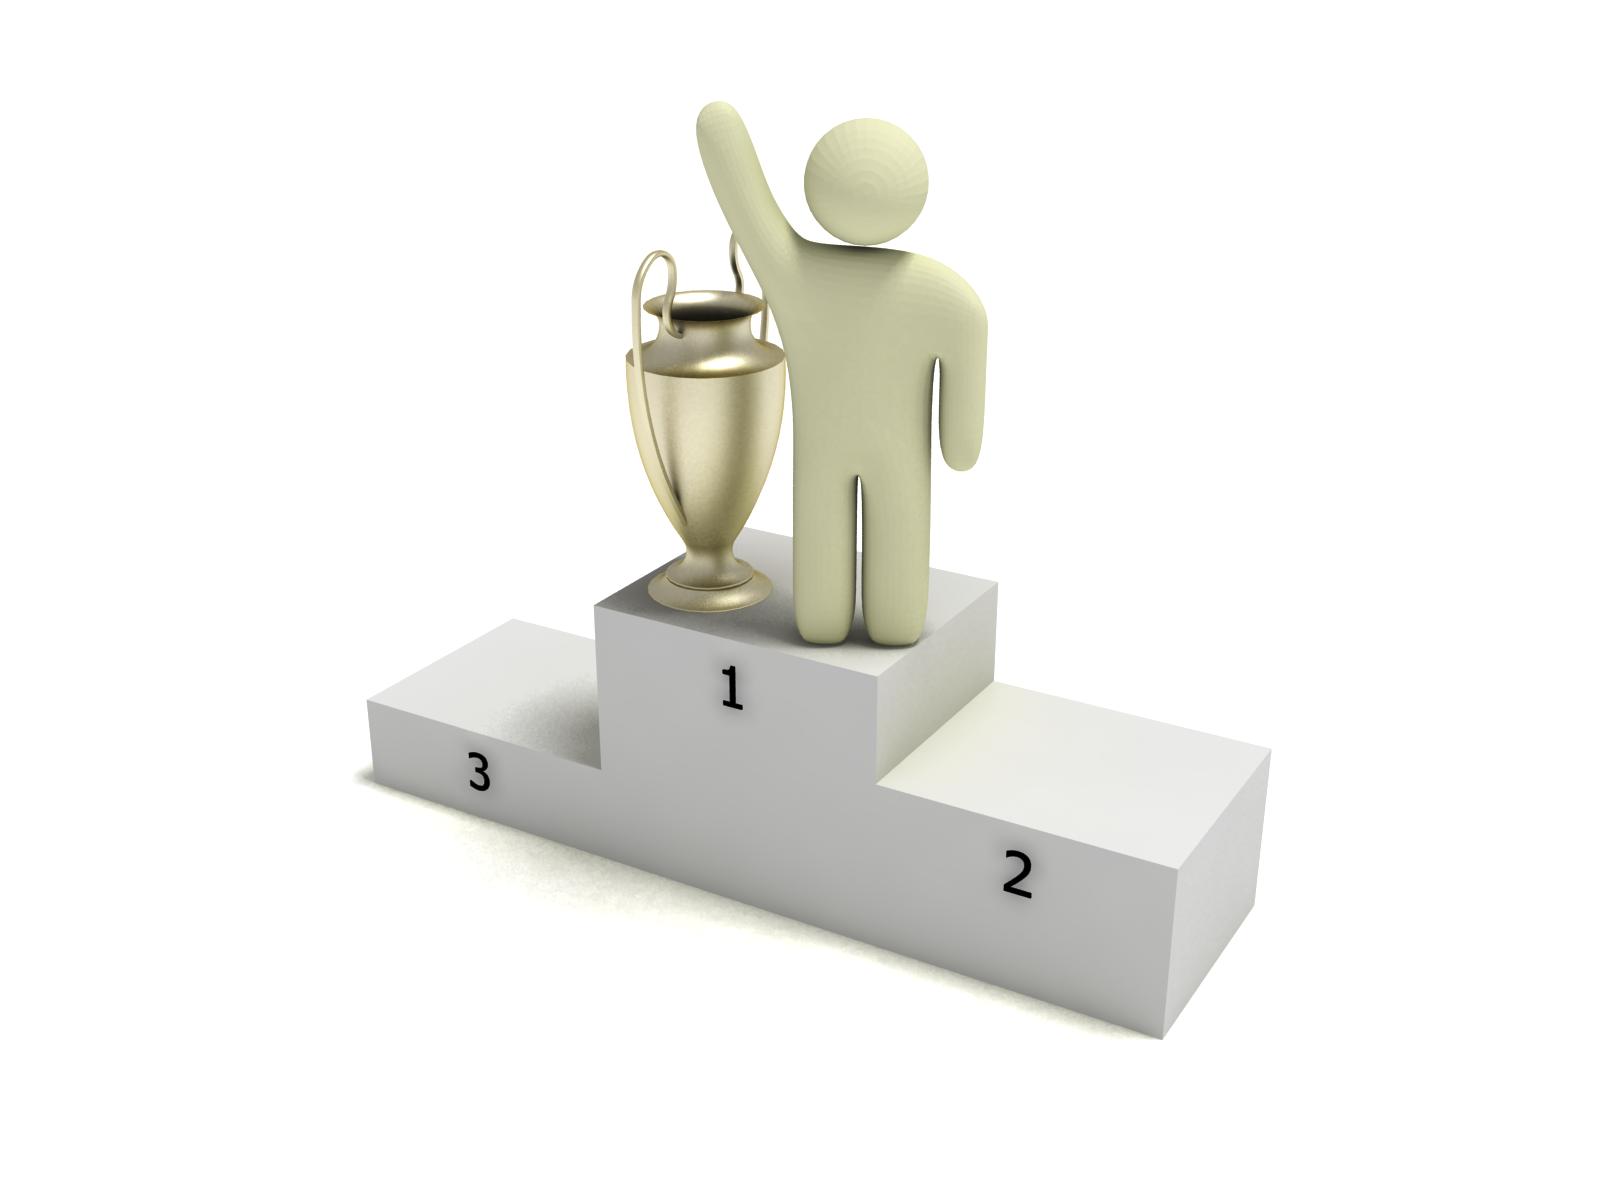 ganadores champion: